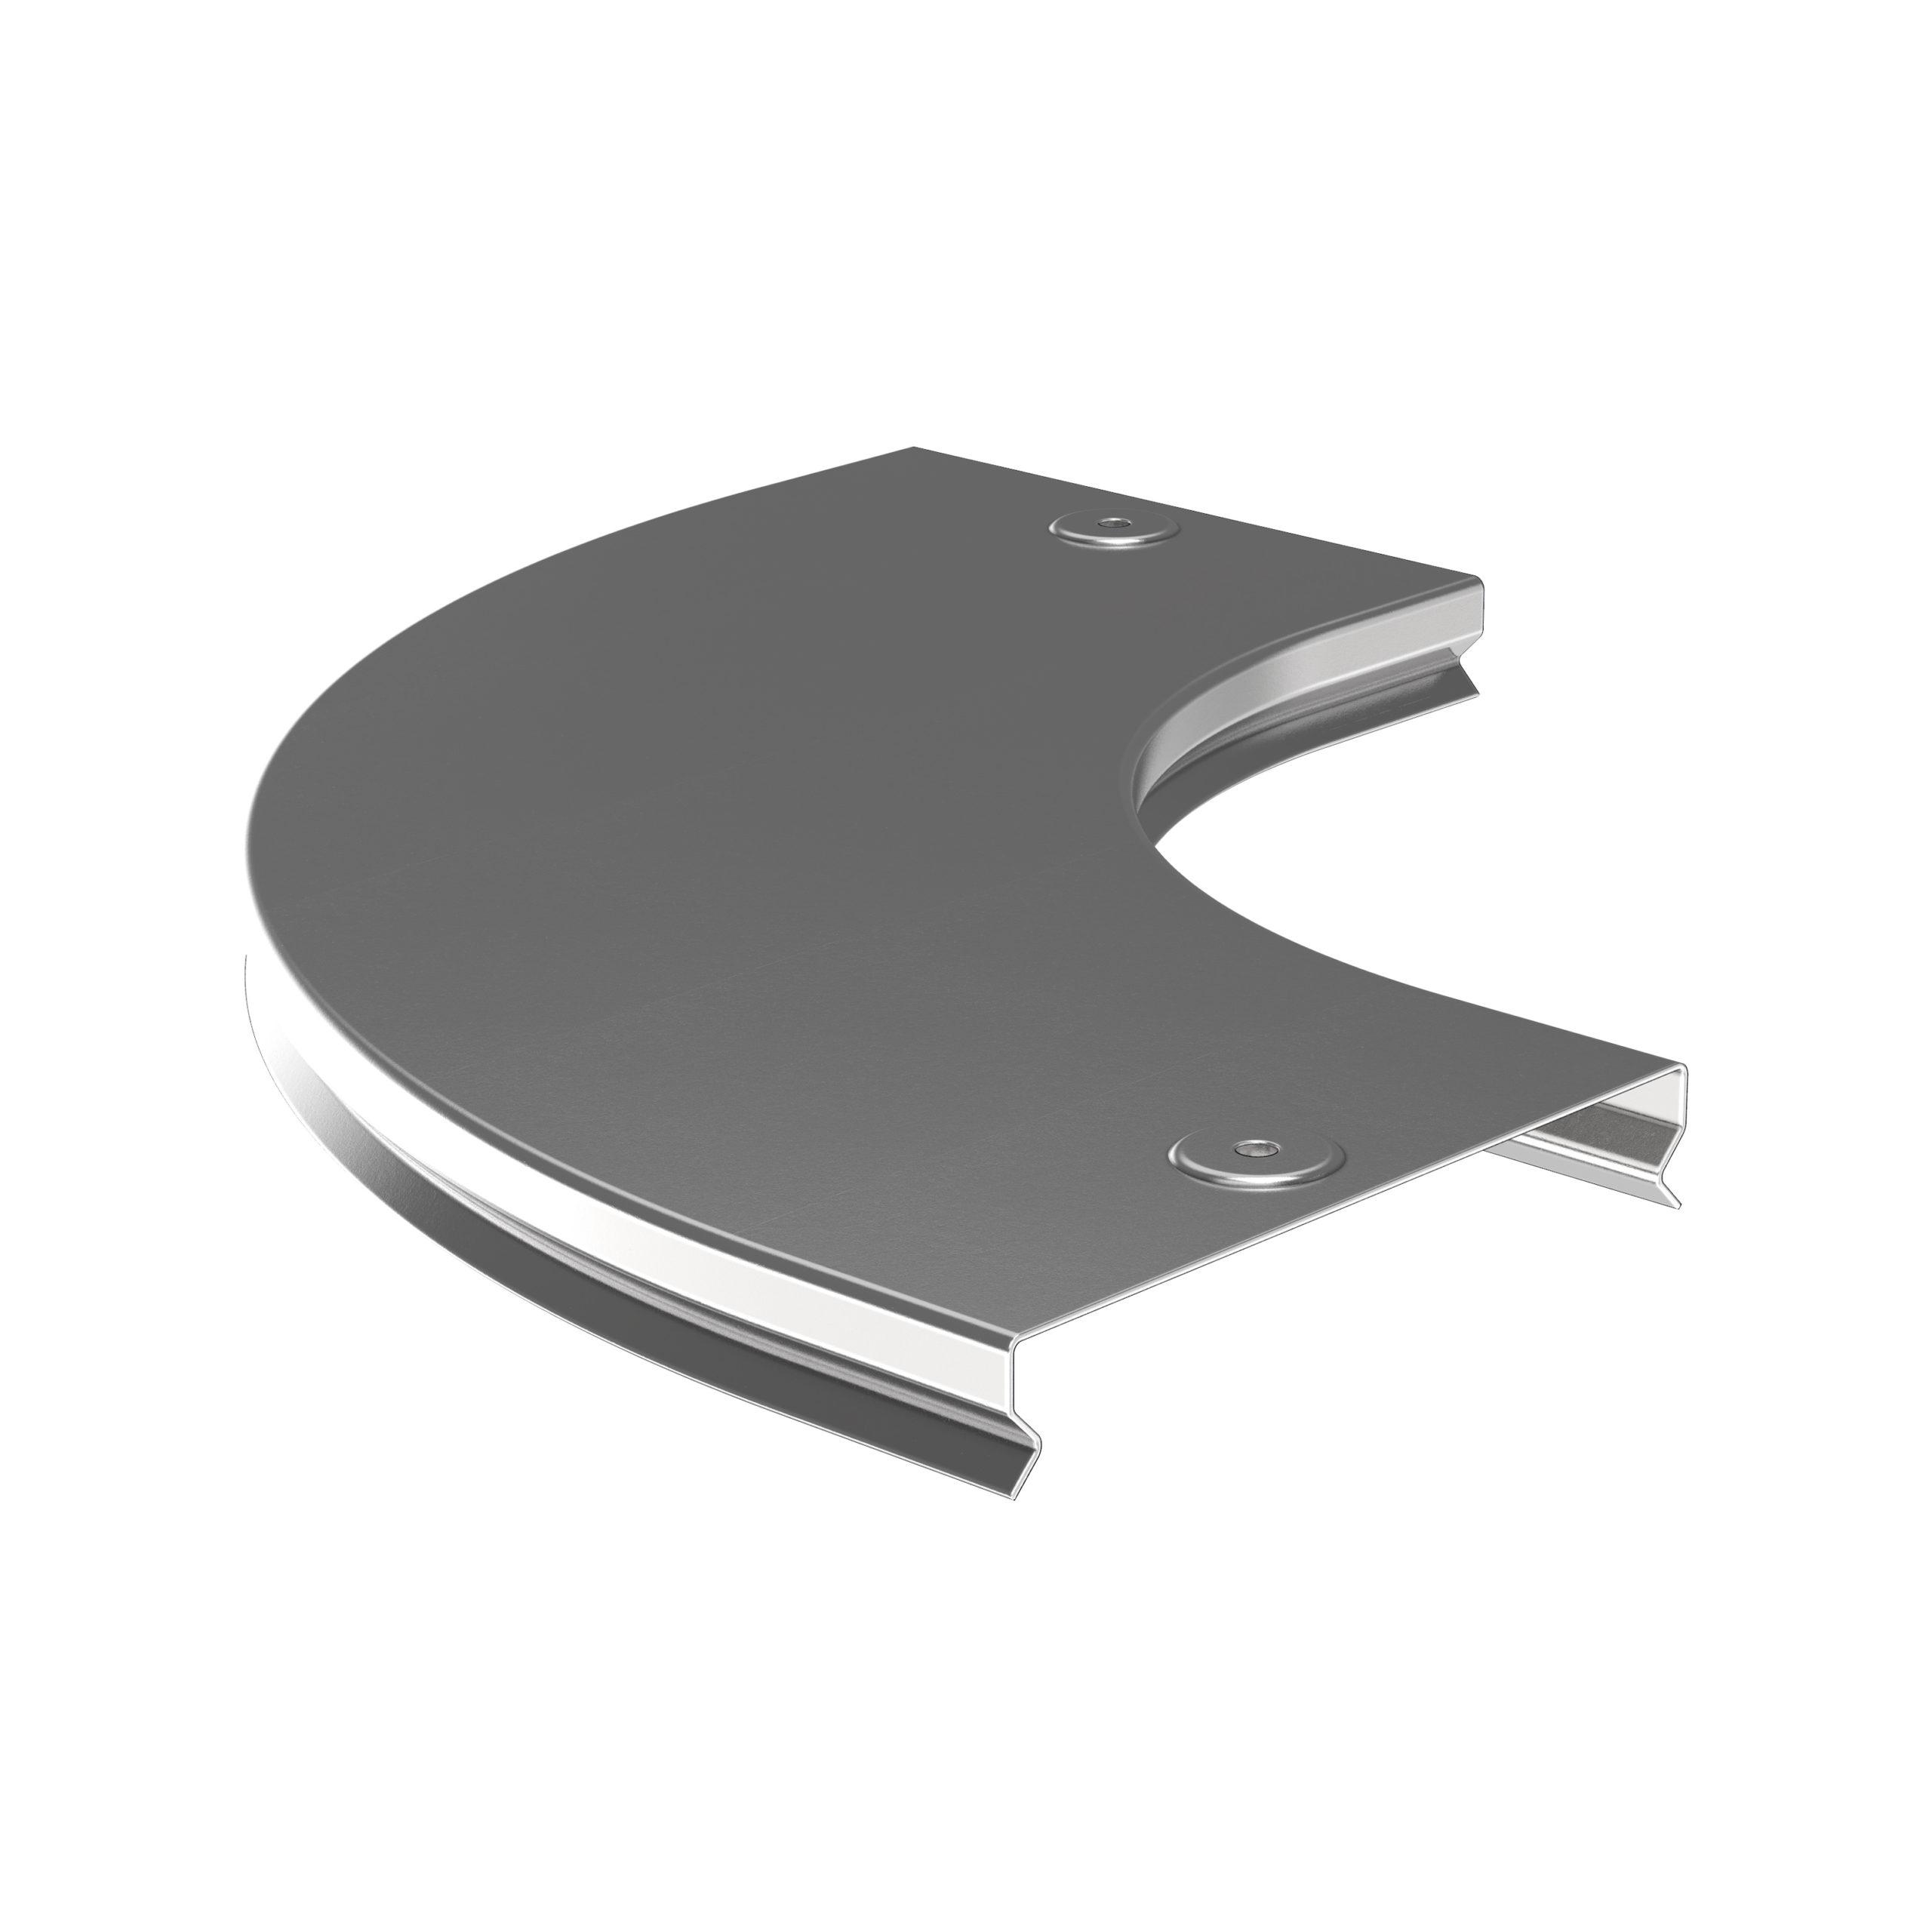 Крышка поворота плавного 90град (тип Г01) ESCA 300мм IEK 1